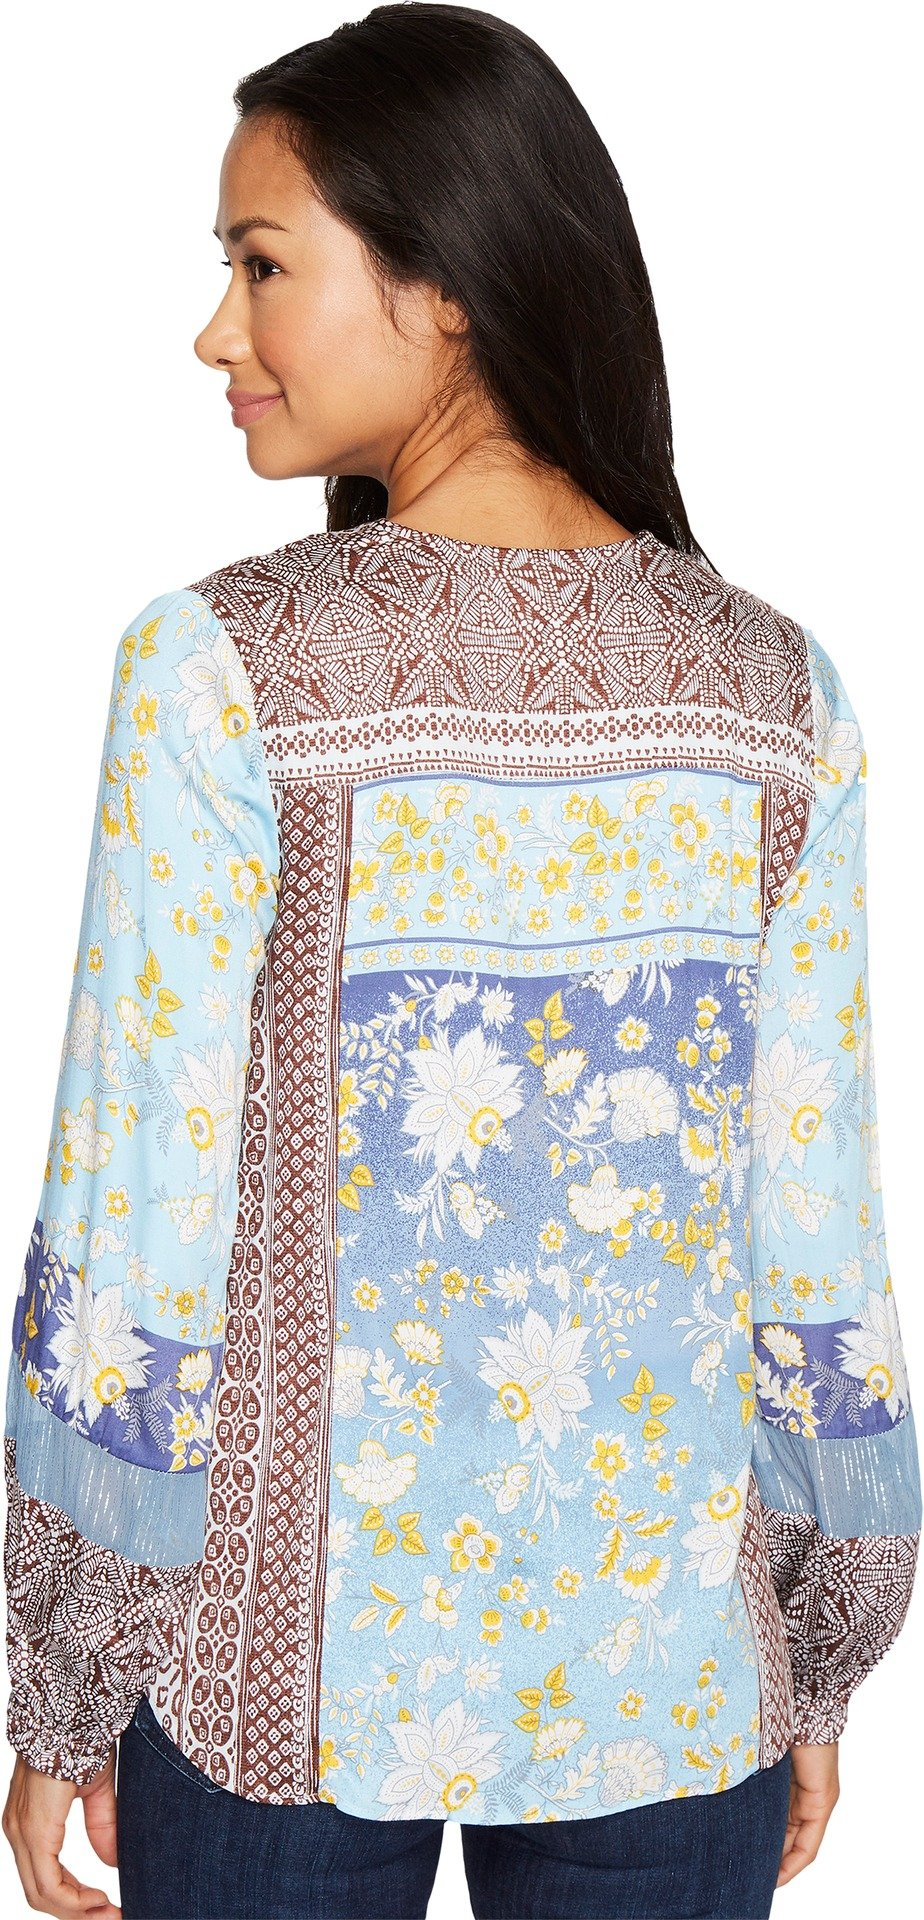 Hale Bob Women's A Fine Line Stretch Satin Woven Top Blue Shirt